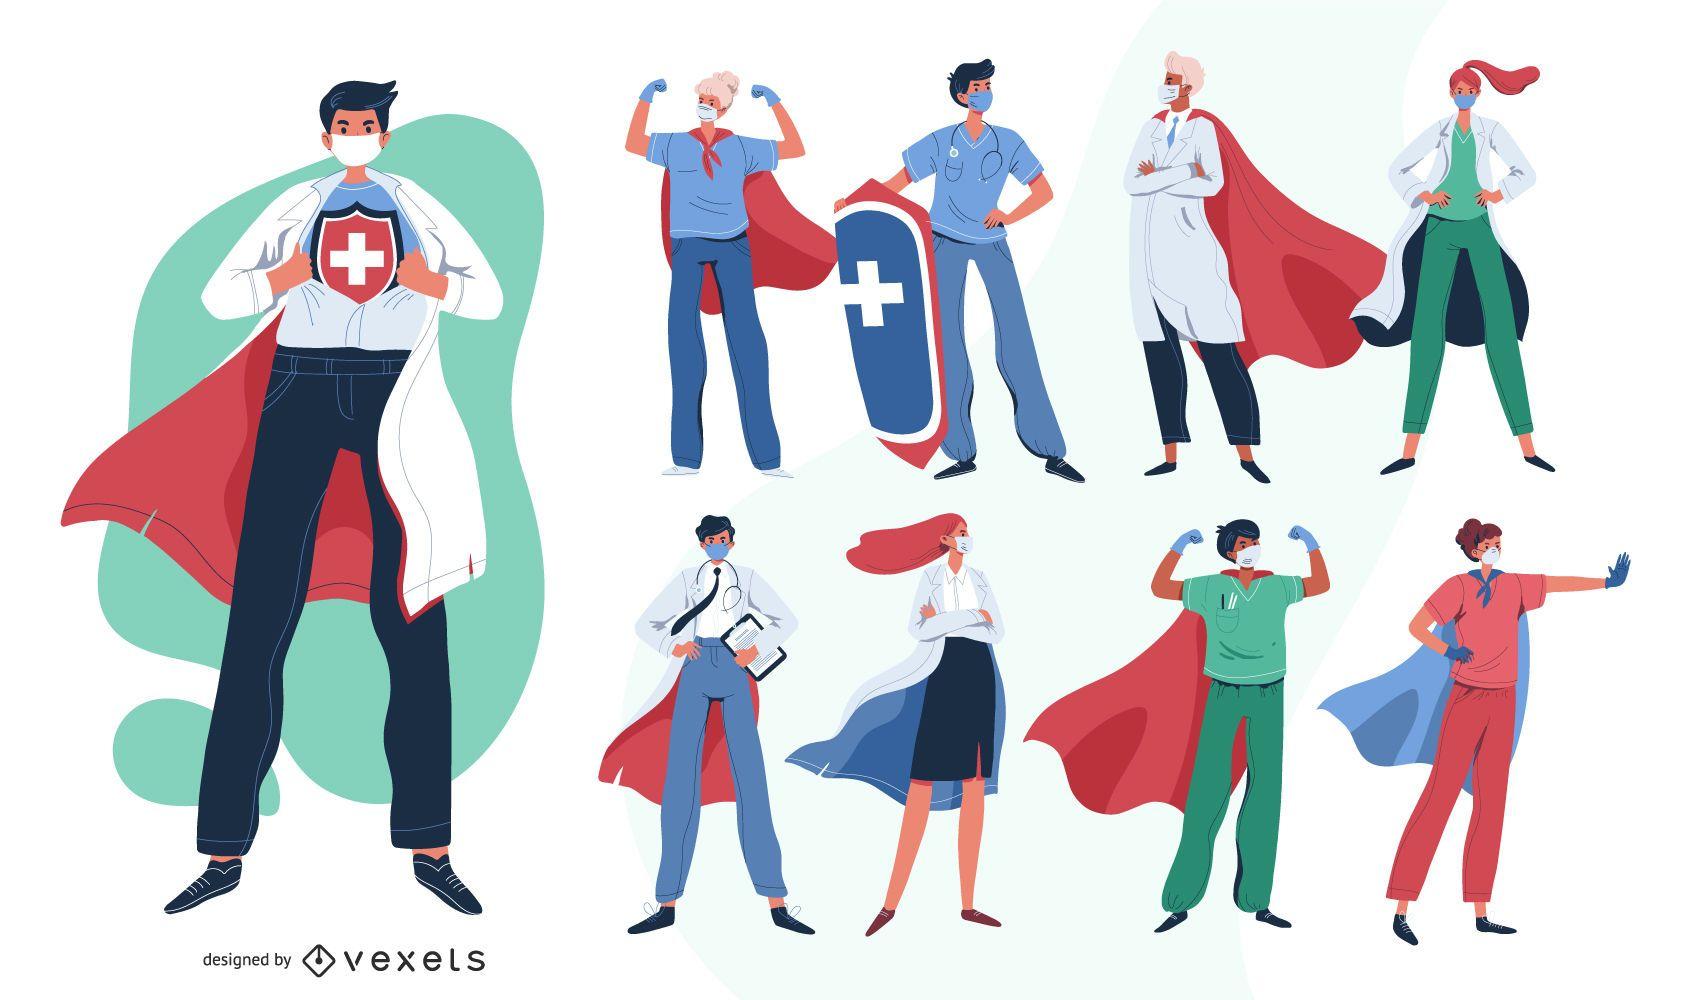 Doctors heroes character pack